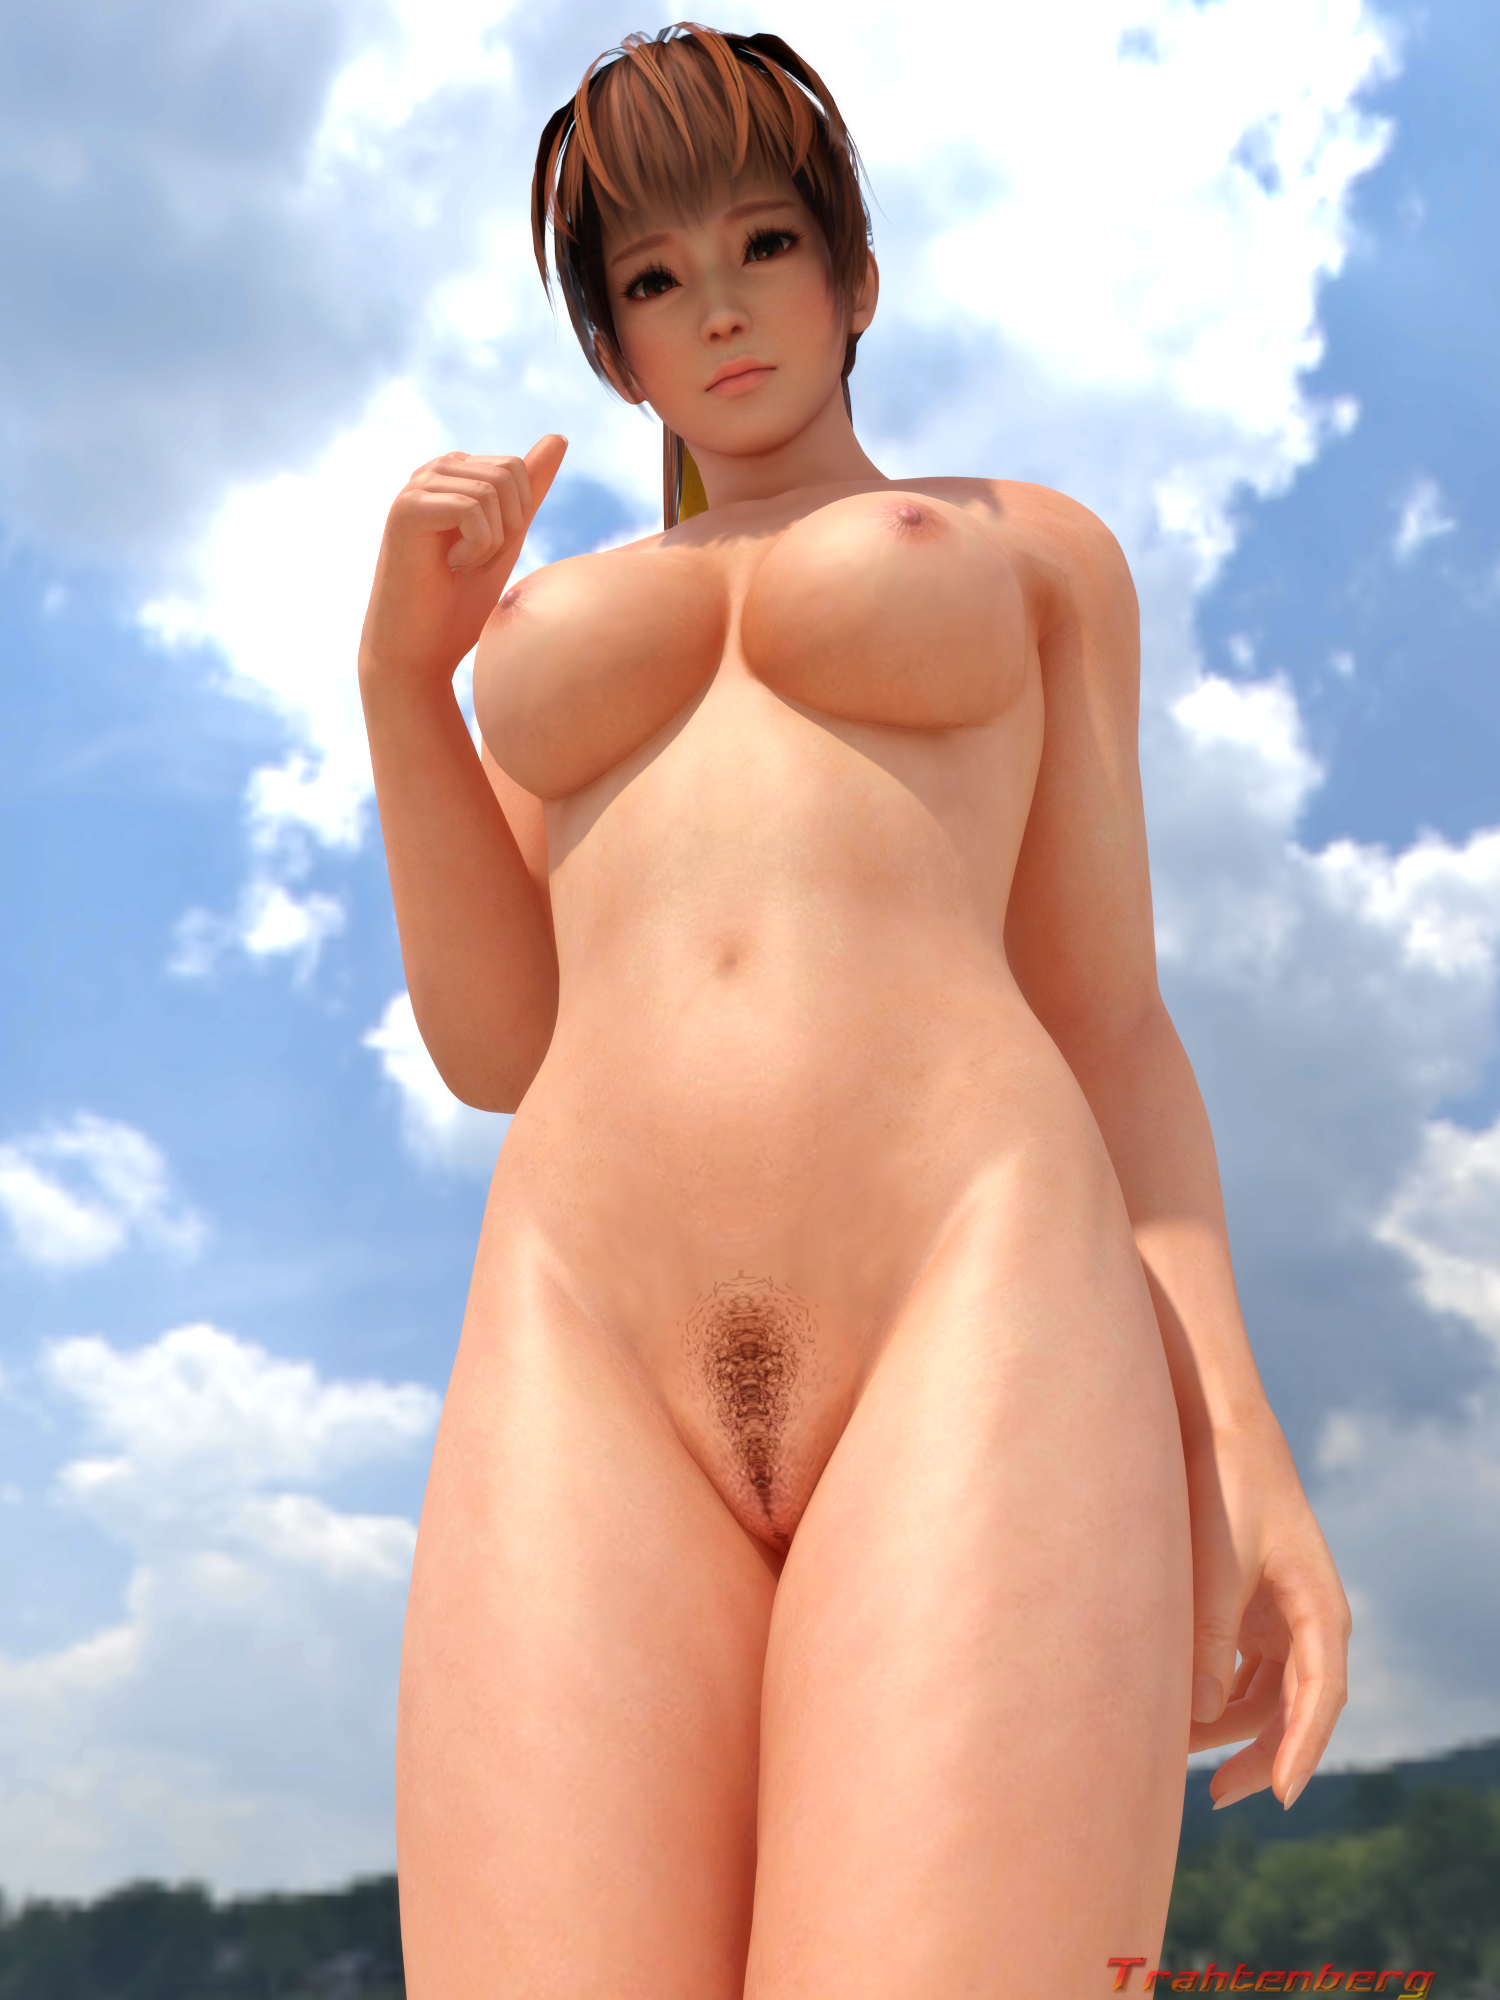 Nude kasumi mod hentai comics